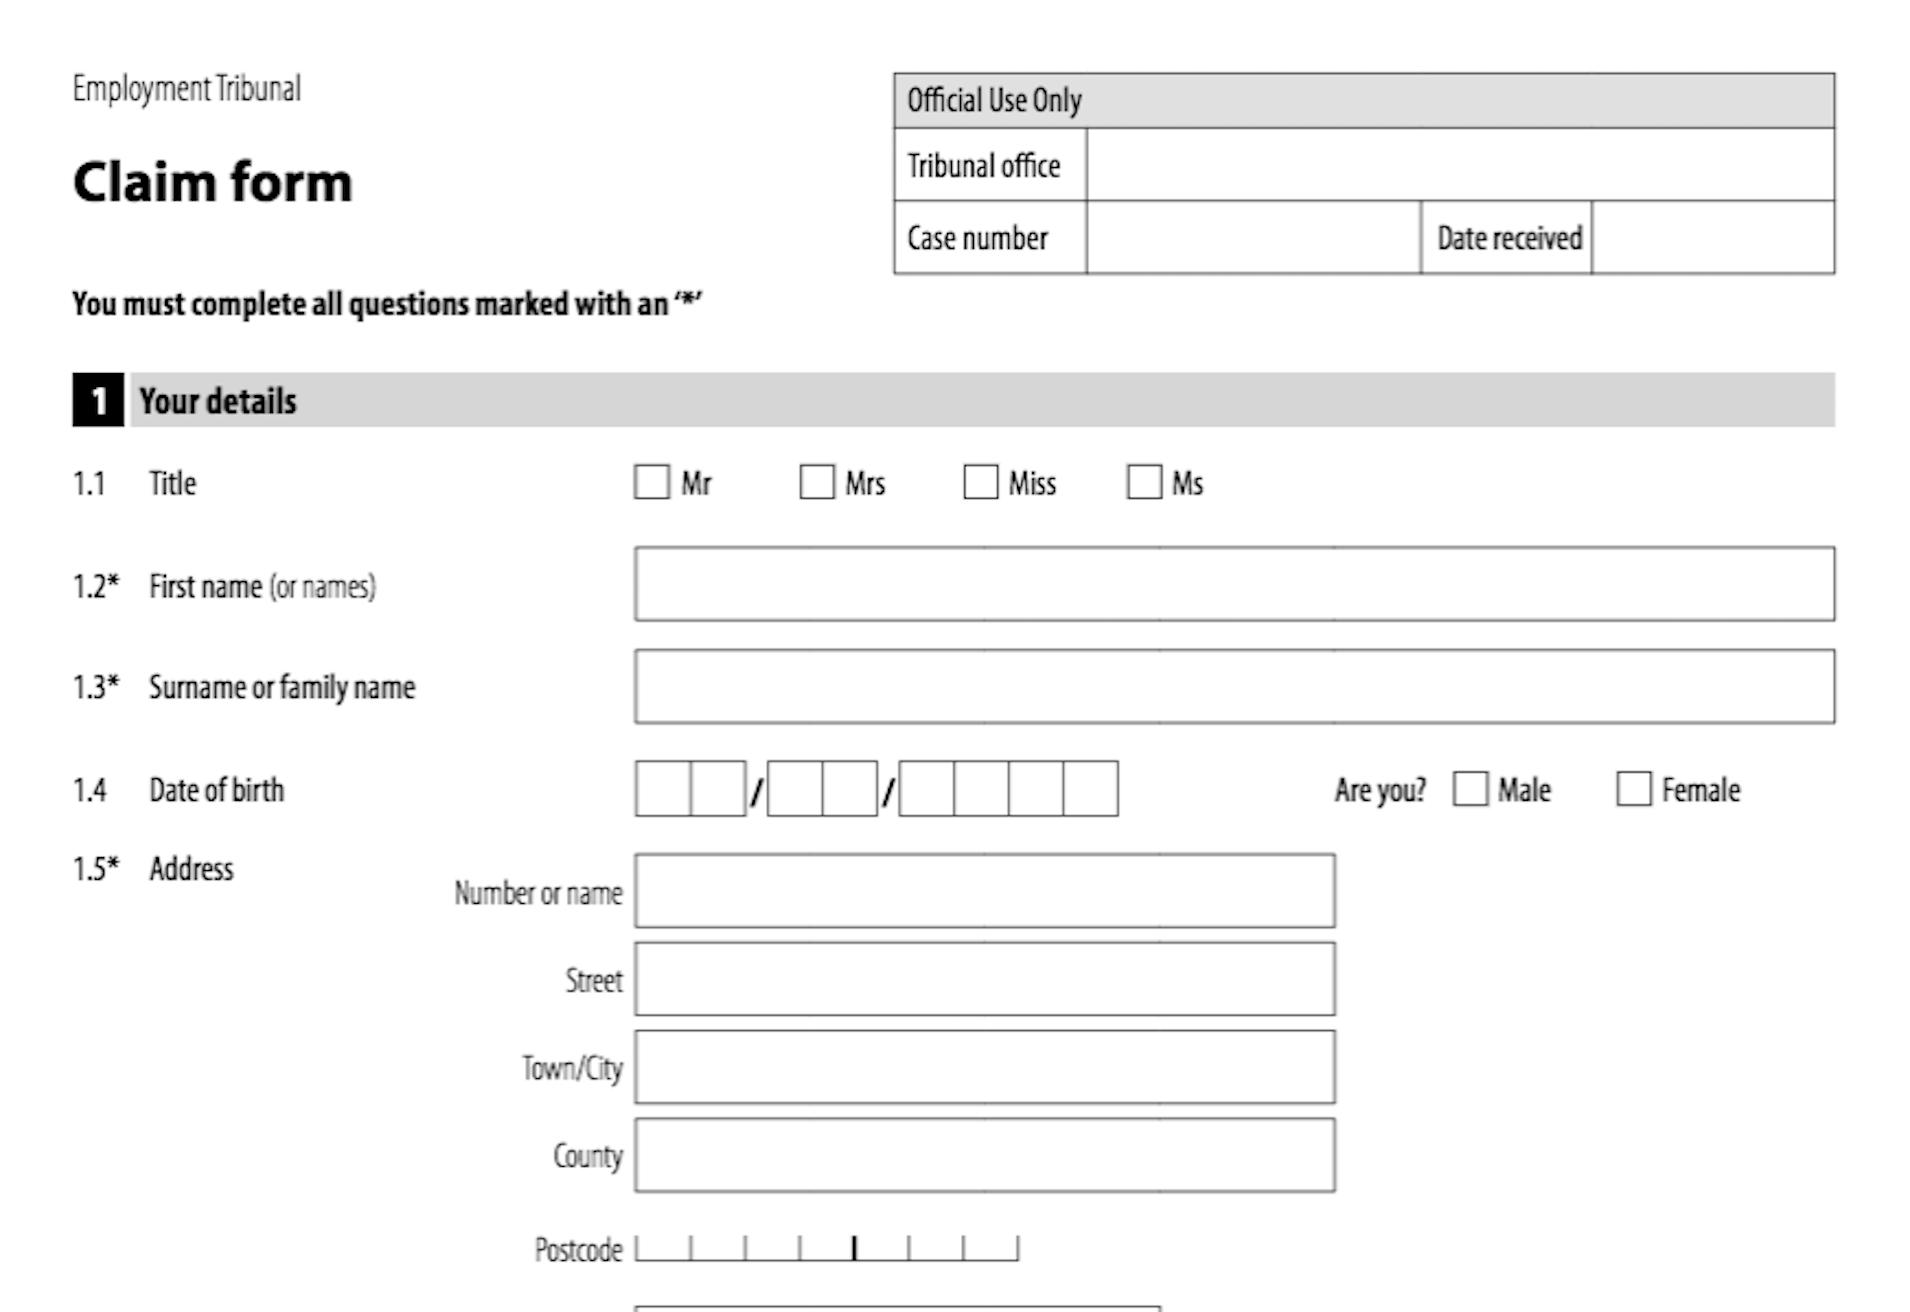 Employment Tribunal Timeline ET1 Form